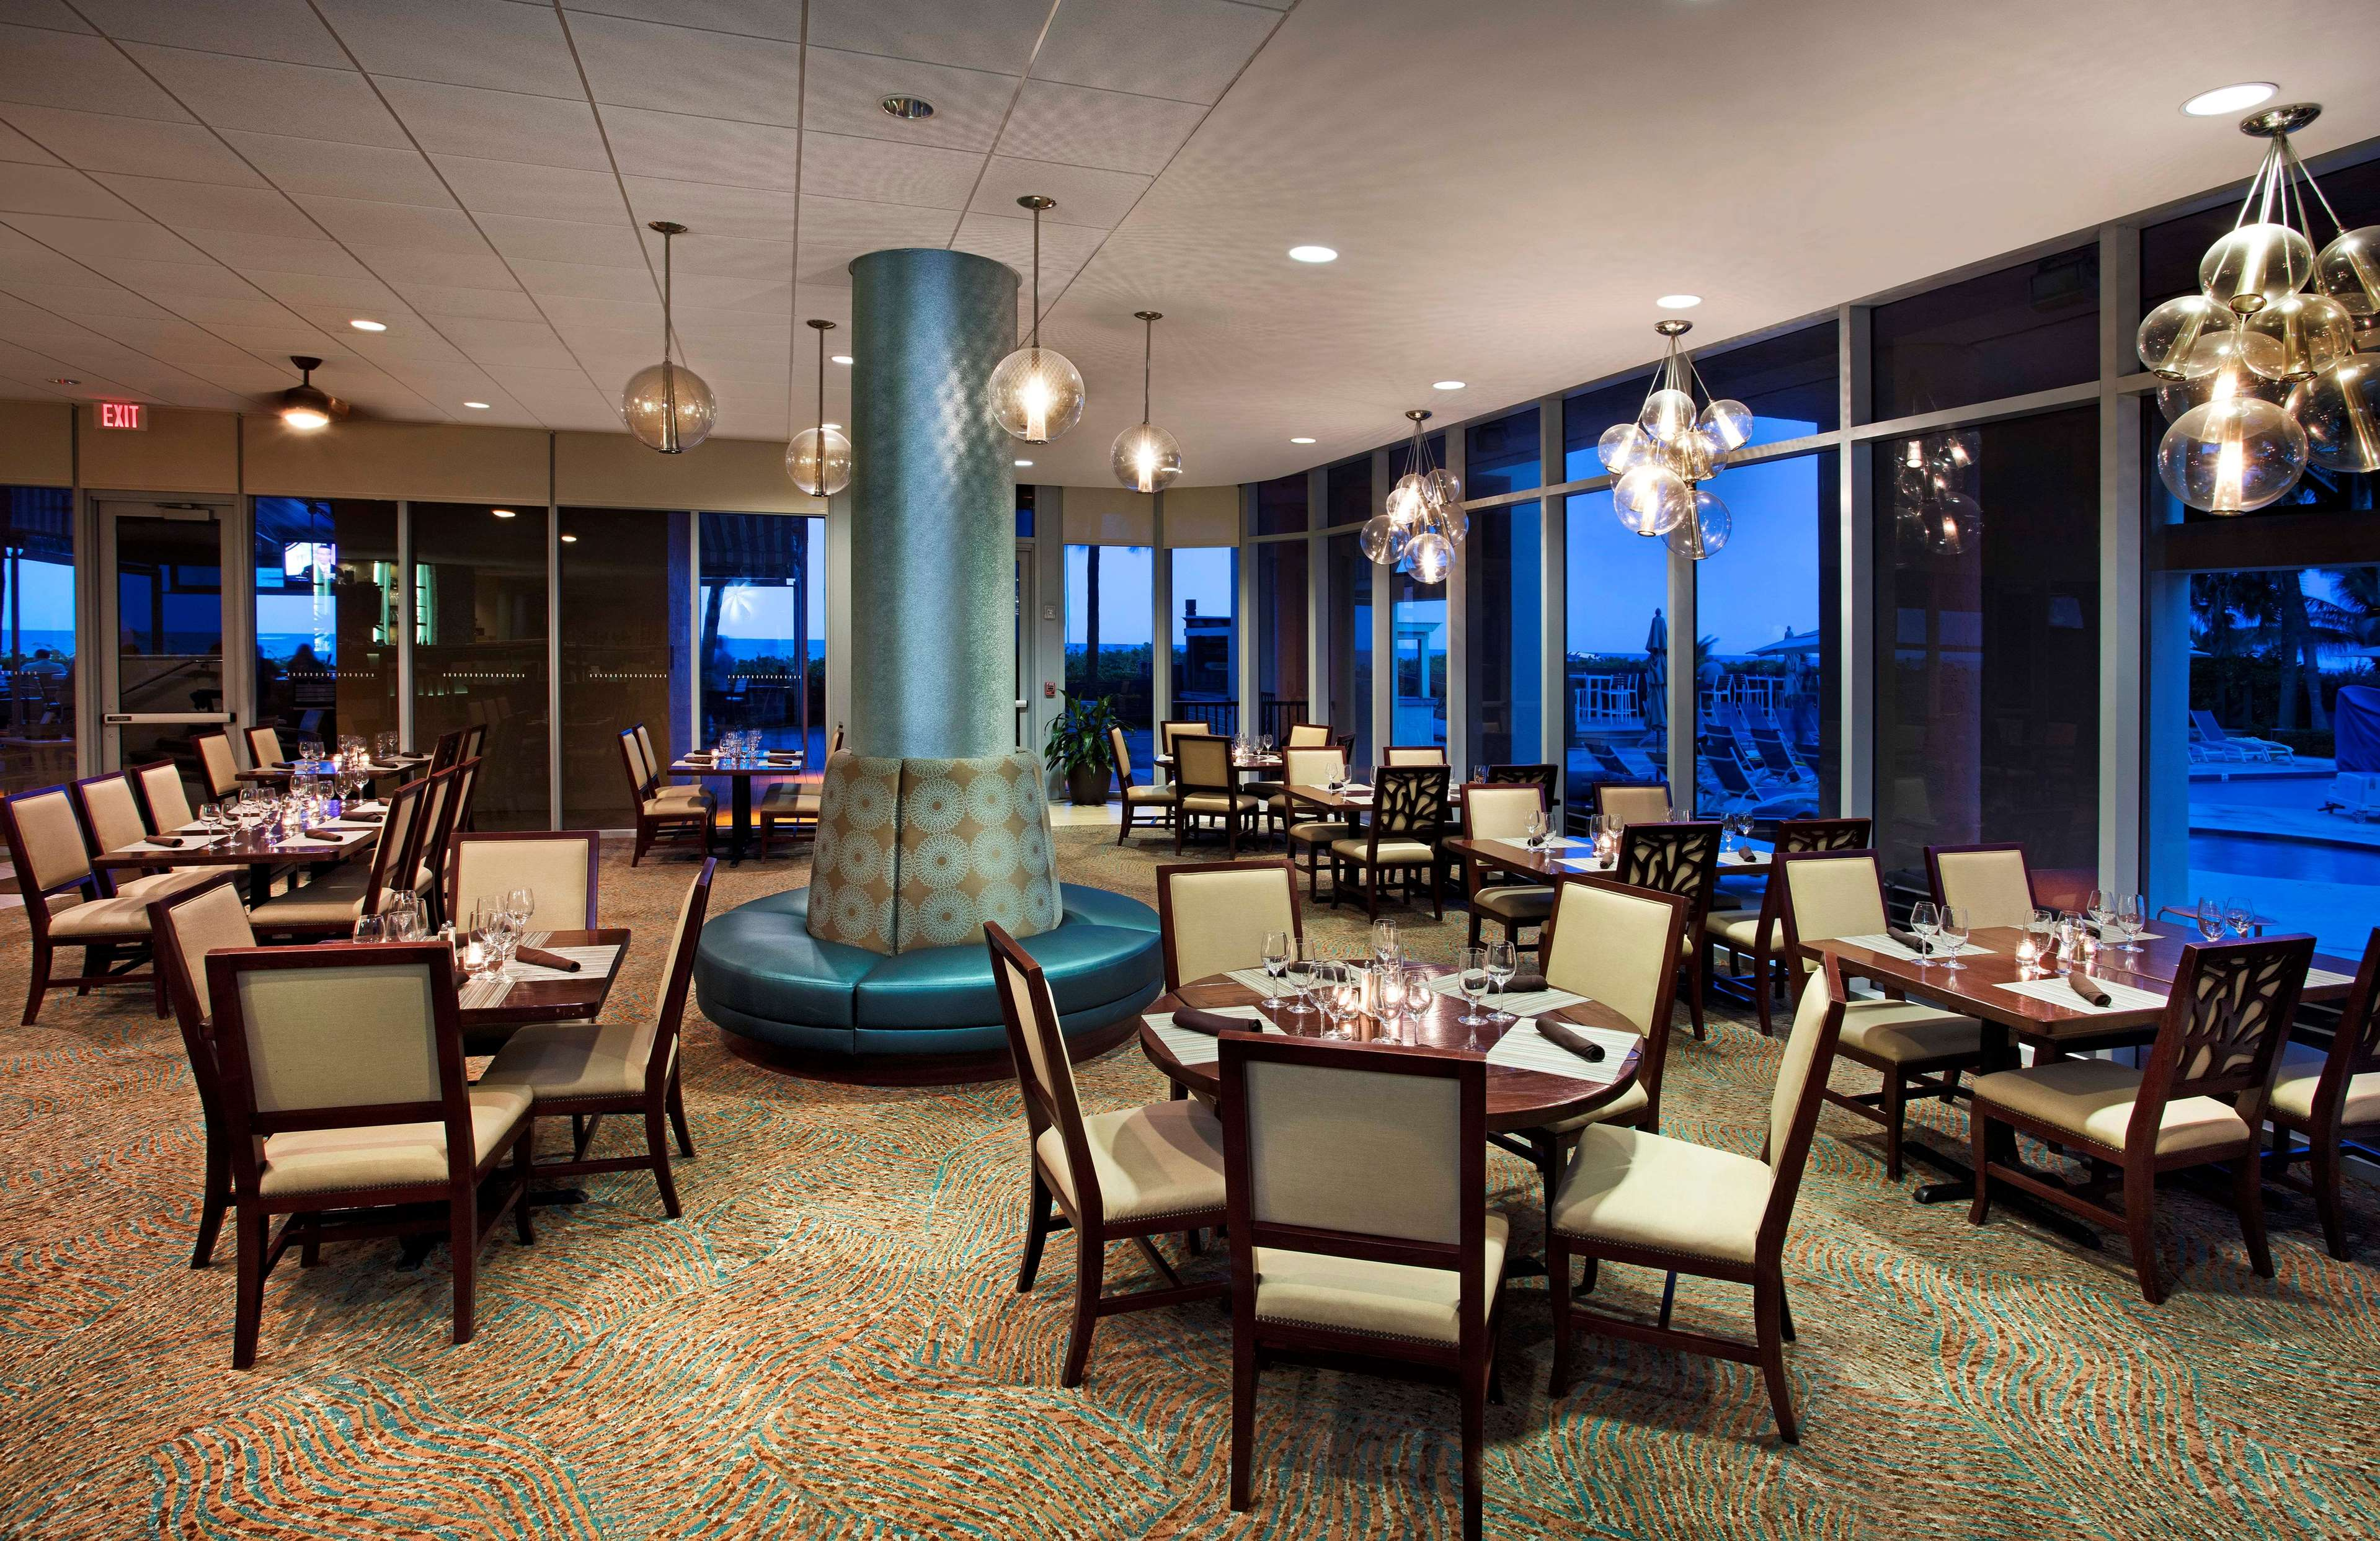 Hilton Singer Island Oceanfront/Palm Beaches Resort image 49